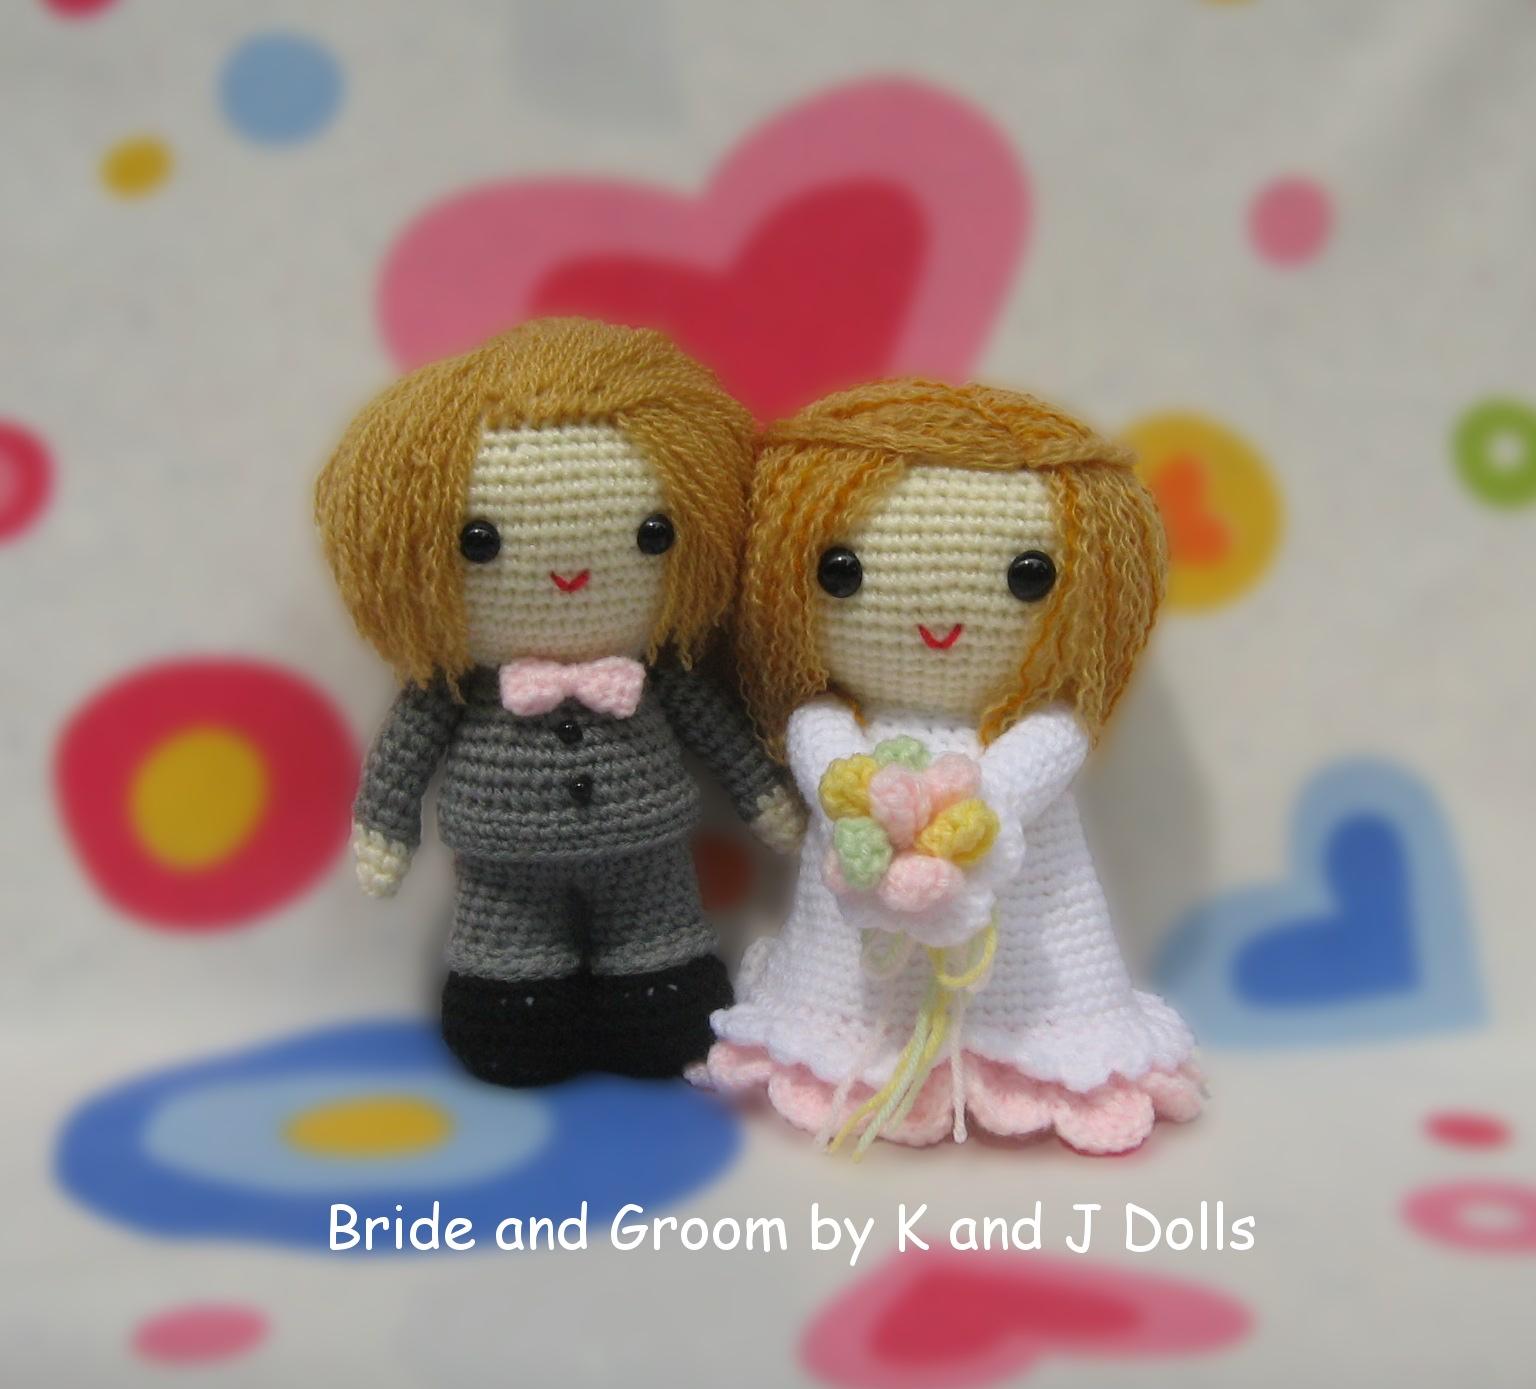 Free Amigurumi Patterns Owls : Bride and Groom bunnies - Sayjai Amigurumi Crochet ...